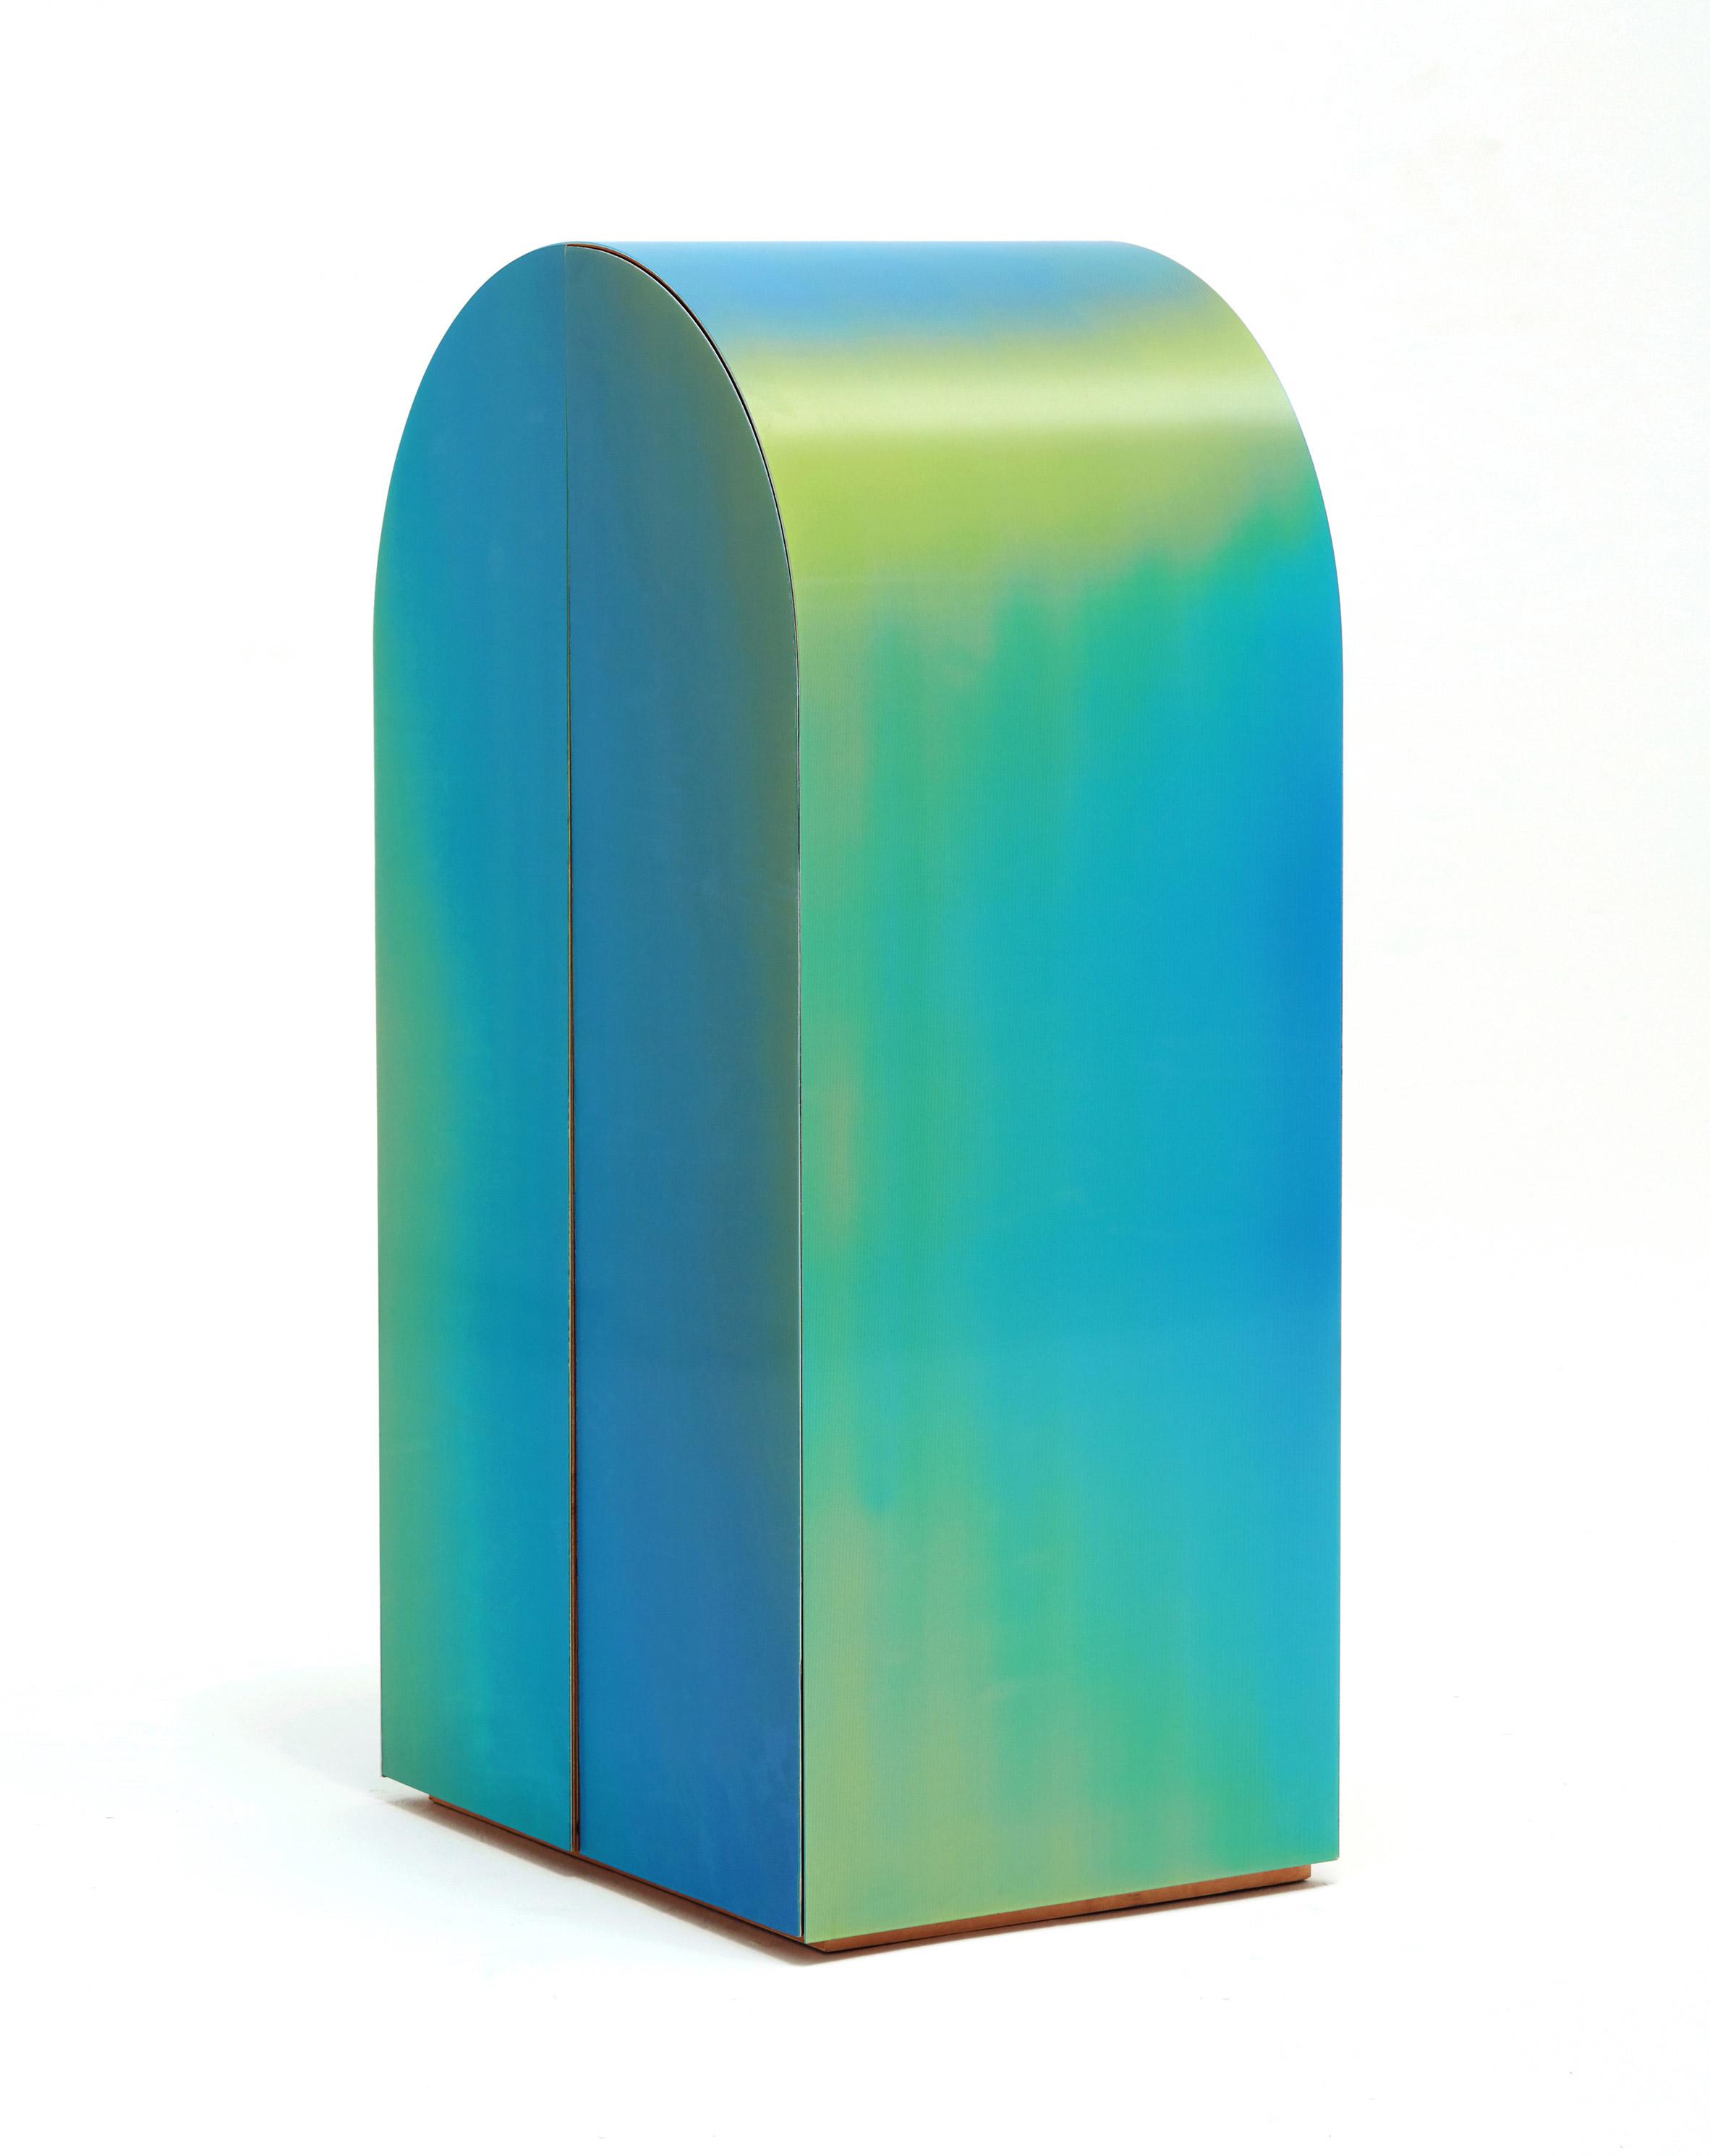 Studio Orijeen's furniture uses lenticular surfaces to